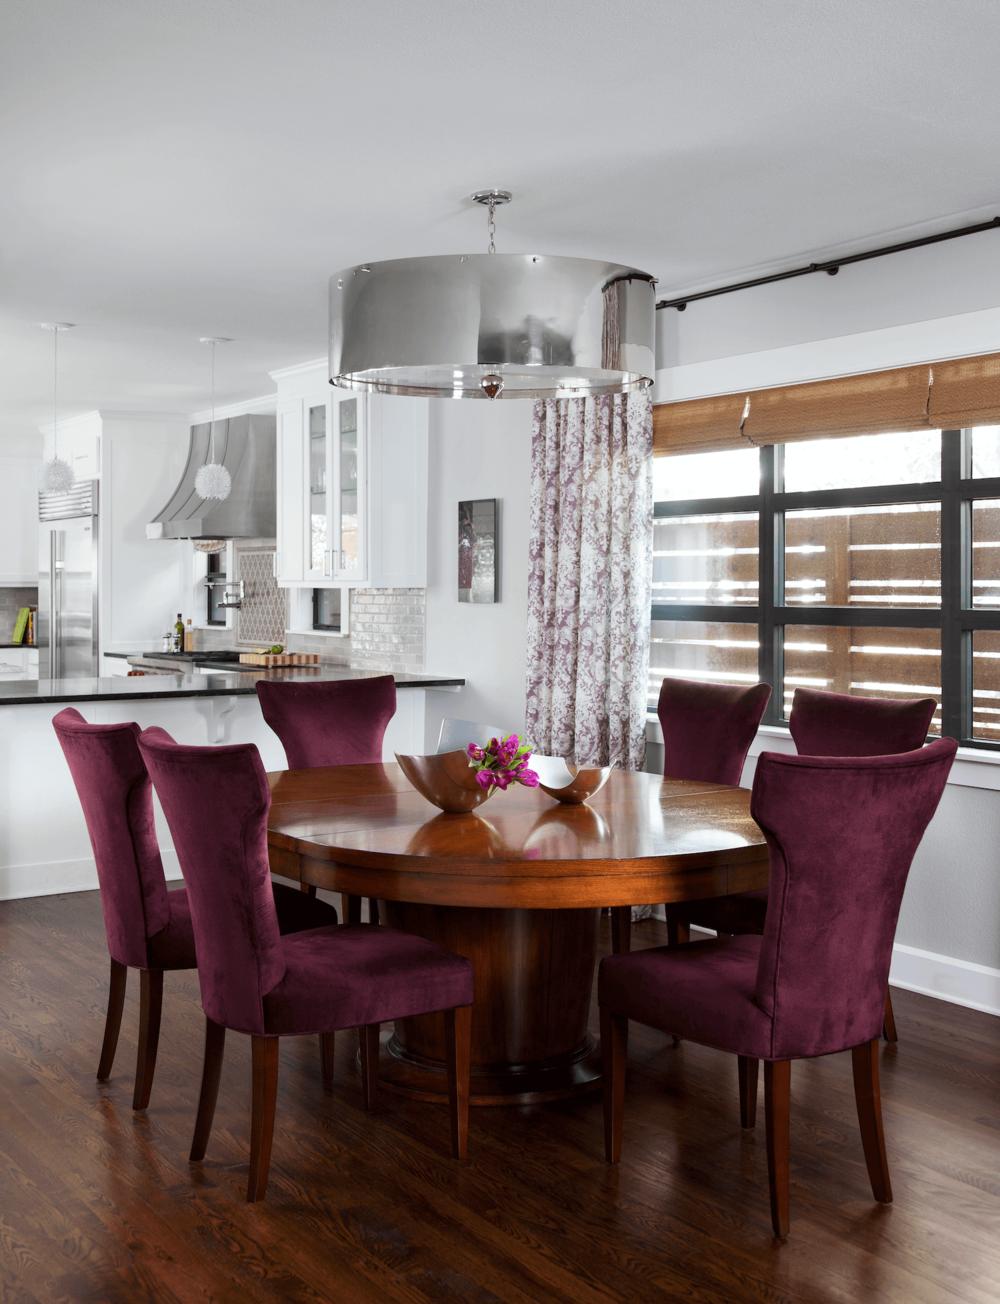 Tarrytown Dining Room | Robin Colton Interior Design Studio Austin Texas | www.robincolton.com